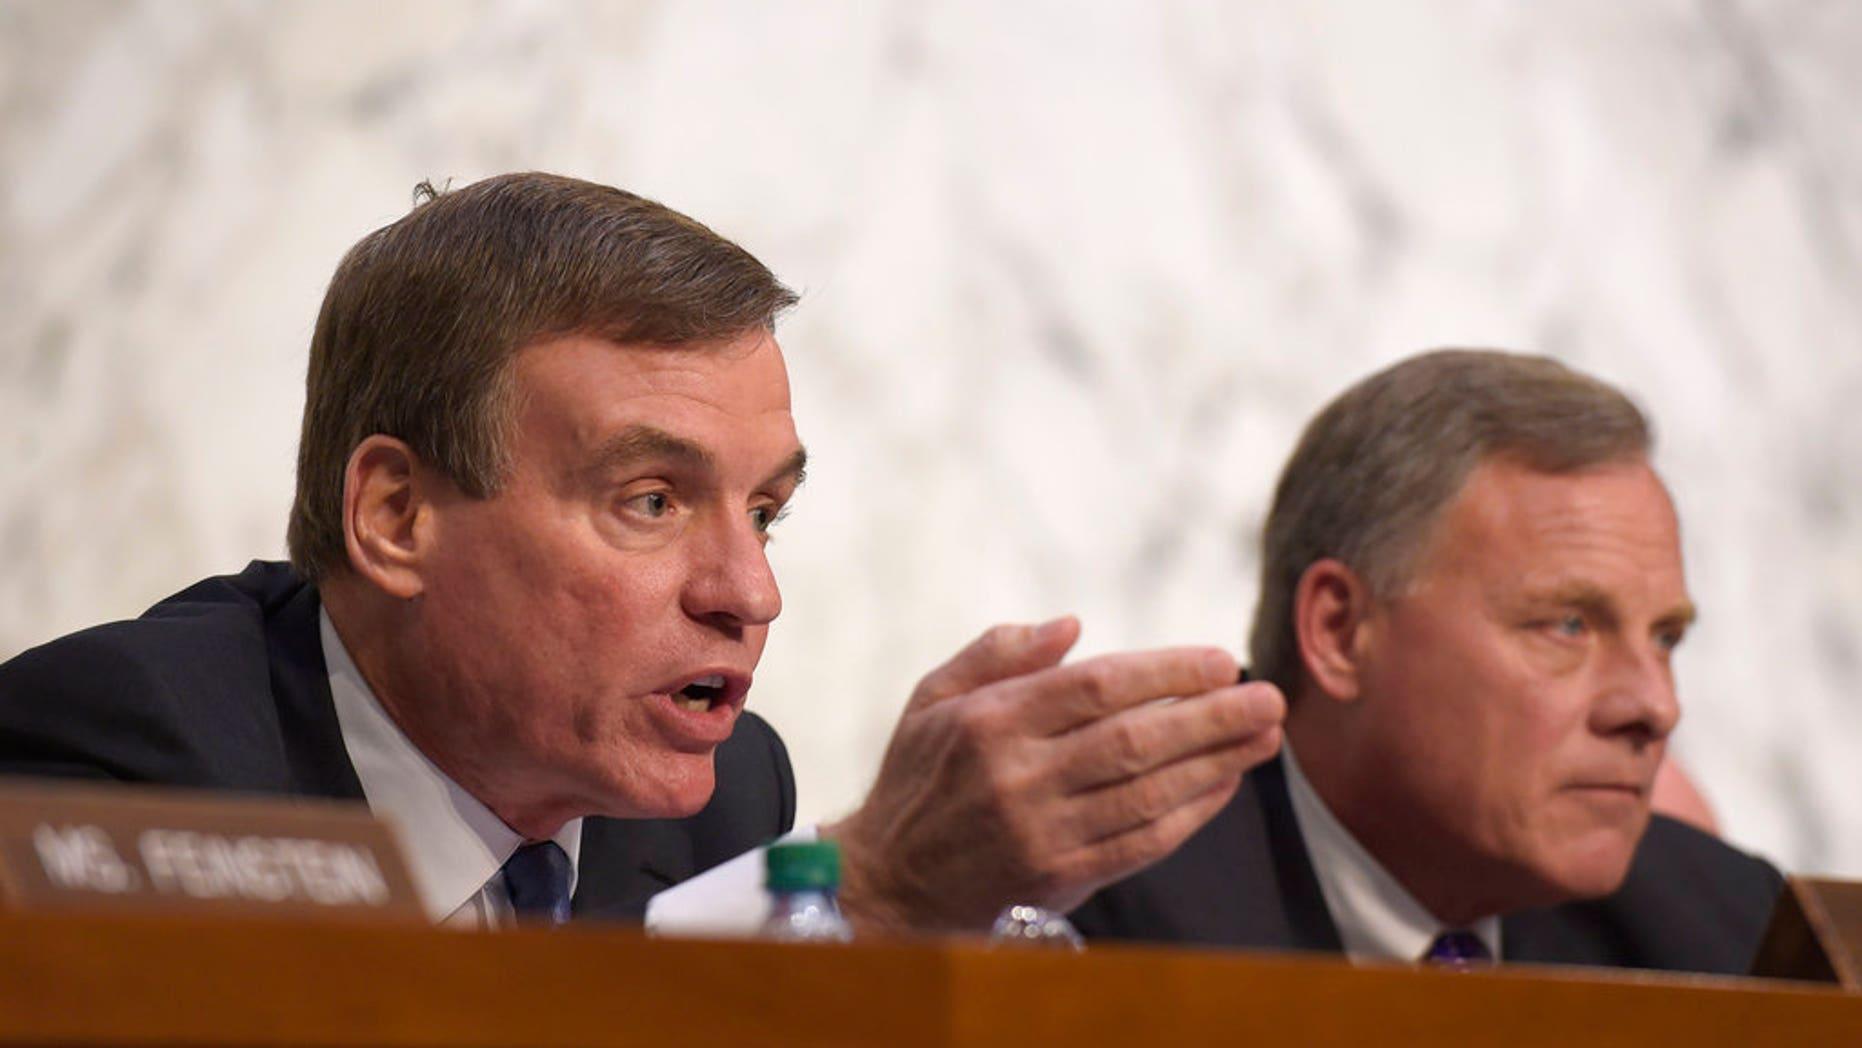 Sen. Mark Warner is the Senate Intelligence Committee's vice chair and top Democrat.